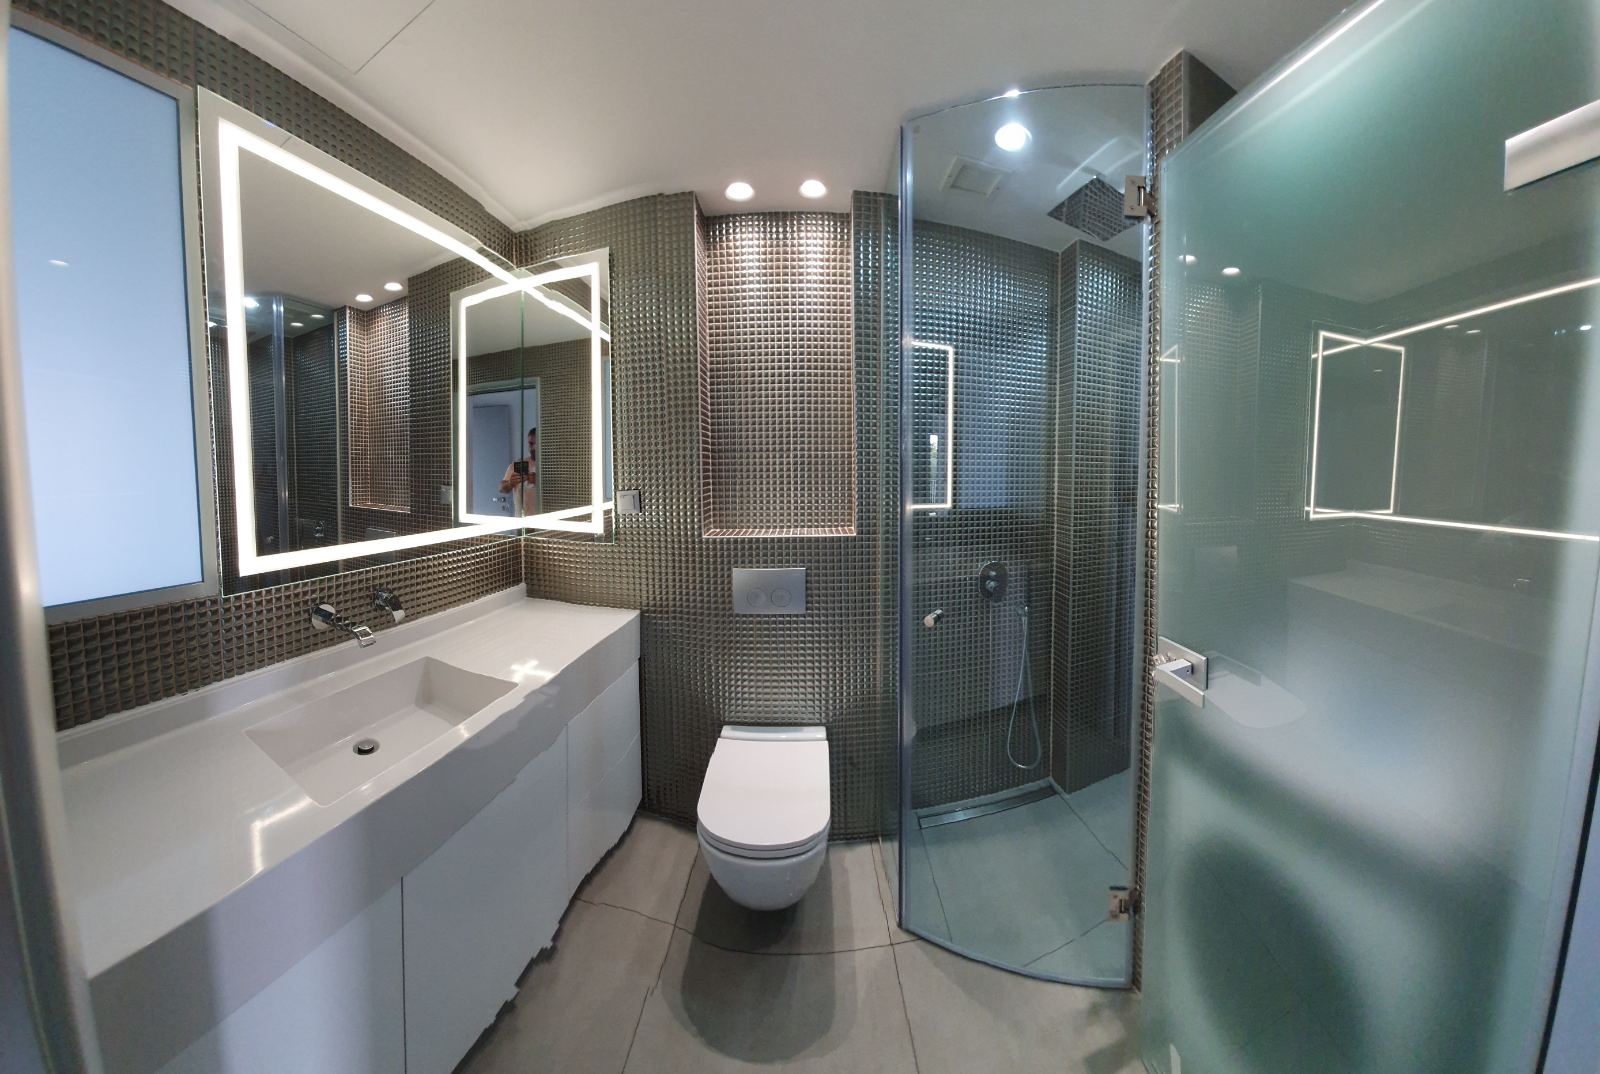 Project υαλουργικά ανακαίνιση μπάνιου.